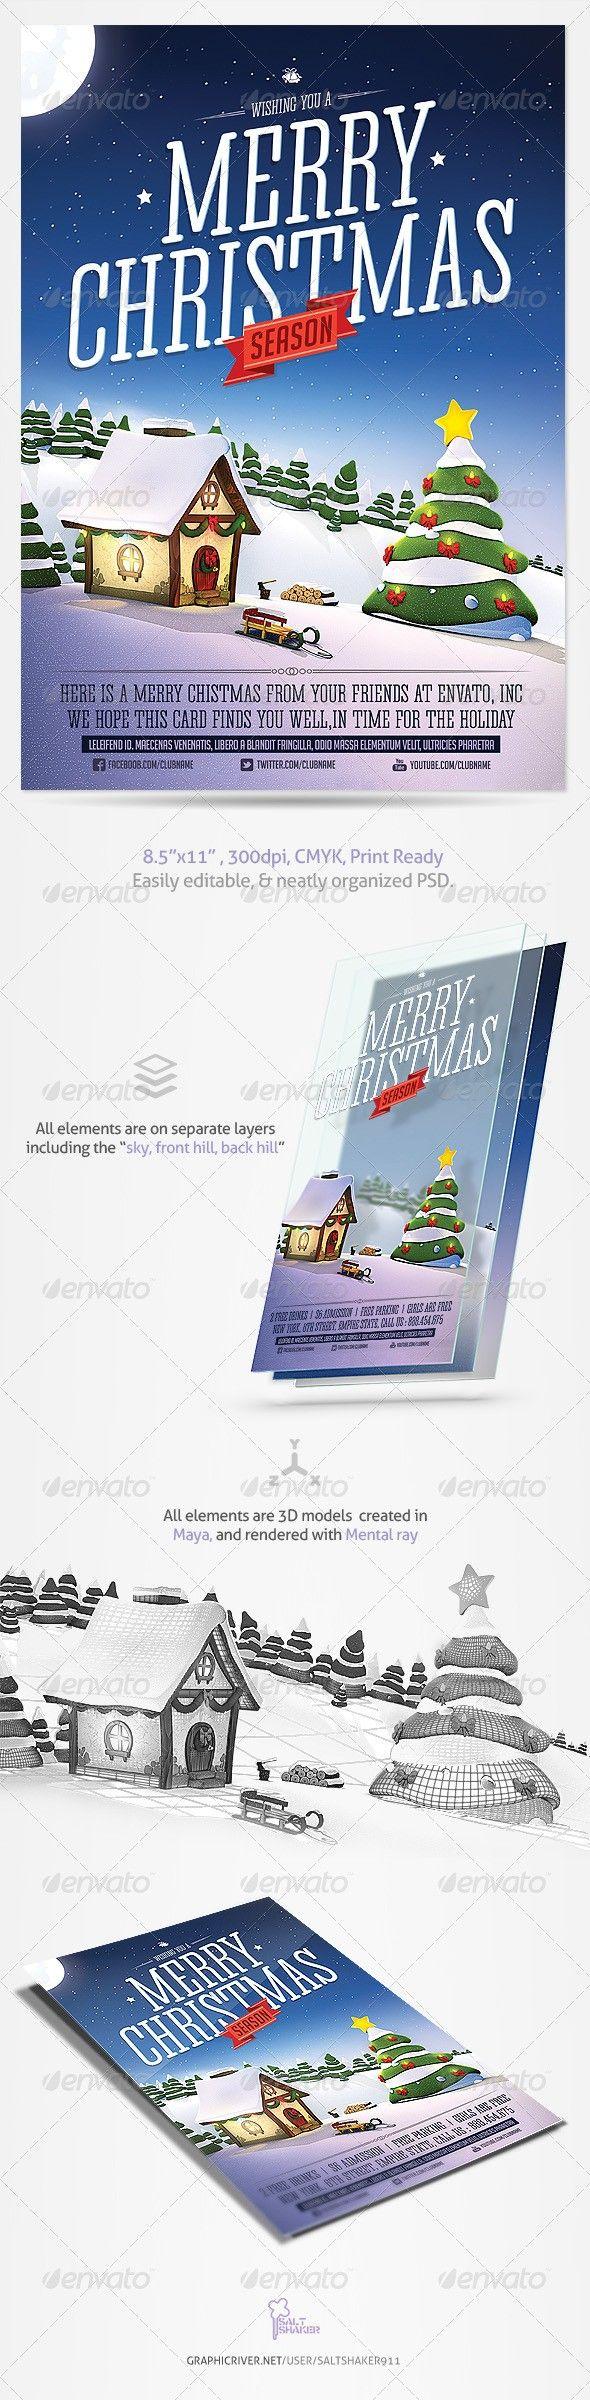 Christmas Greetings Card Template Christmas Greeting Card Template Greeting Card Template Christmas Greeting Cards